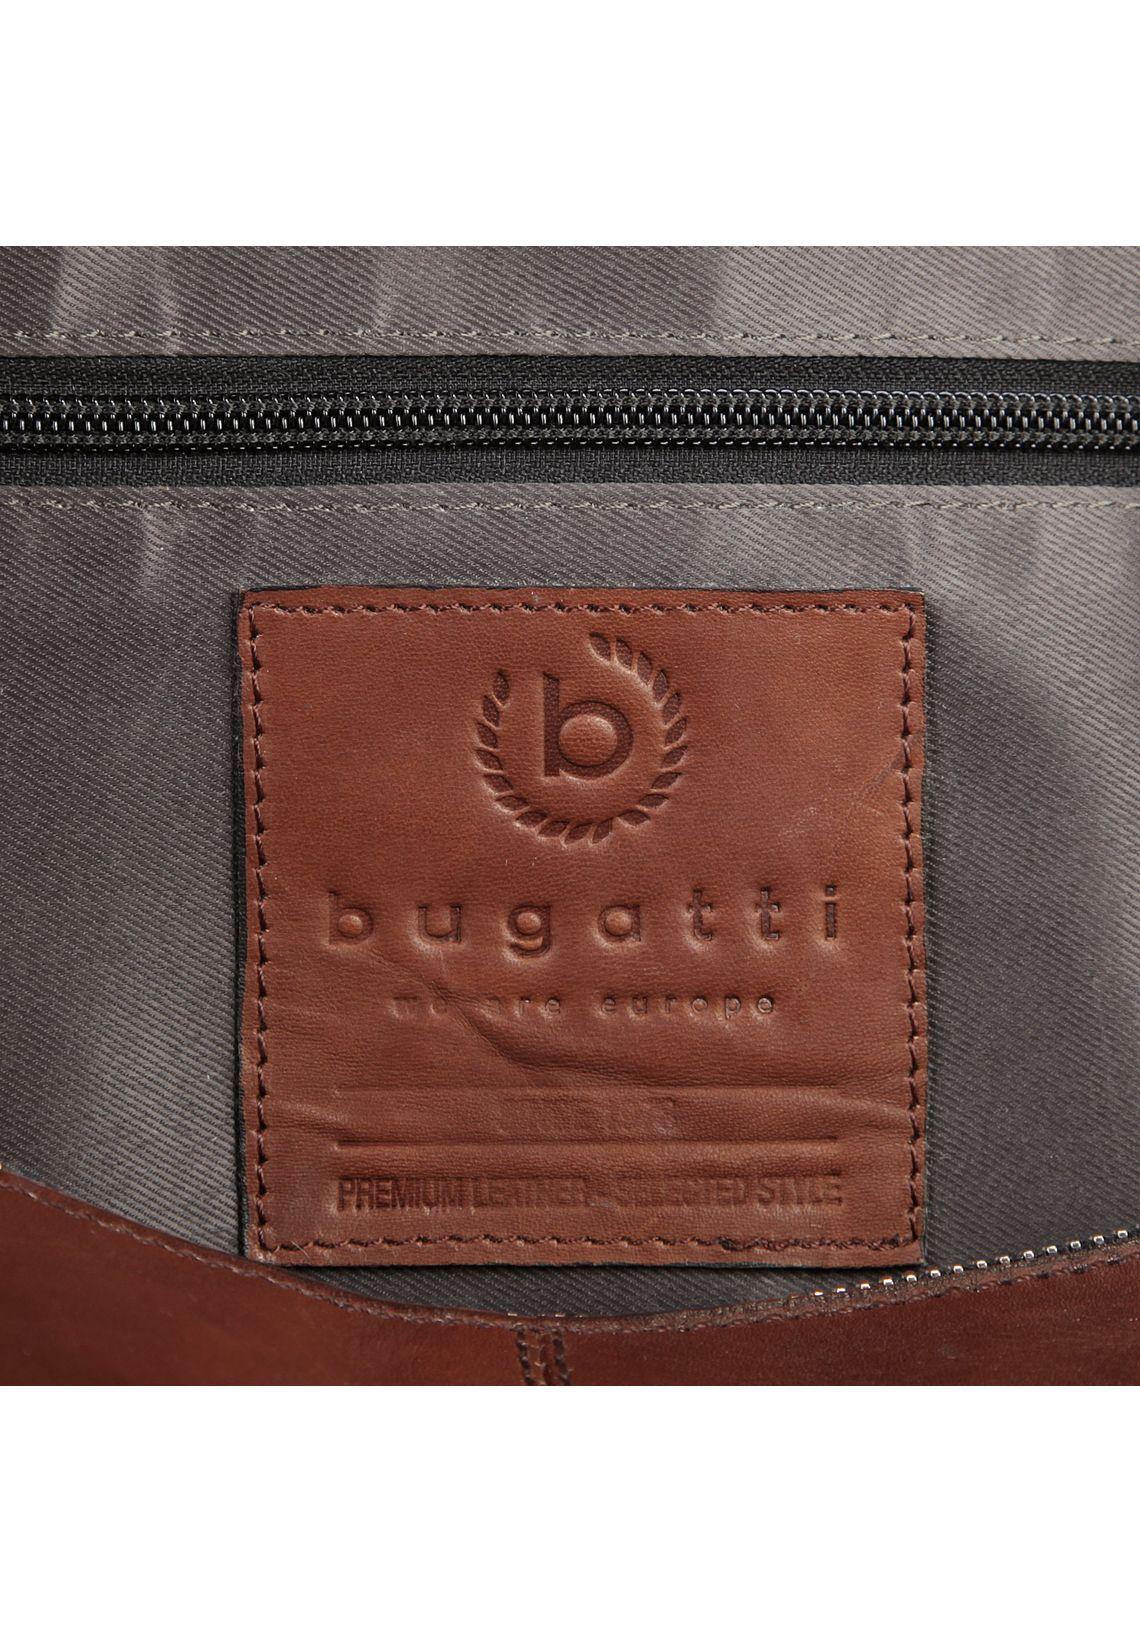 Bugatti reistas  Domus online shoppen  cognac